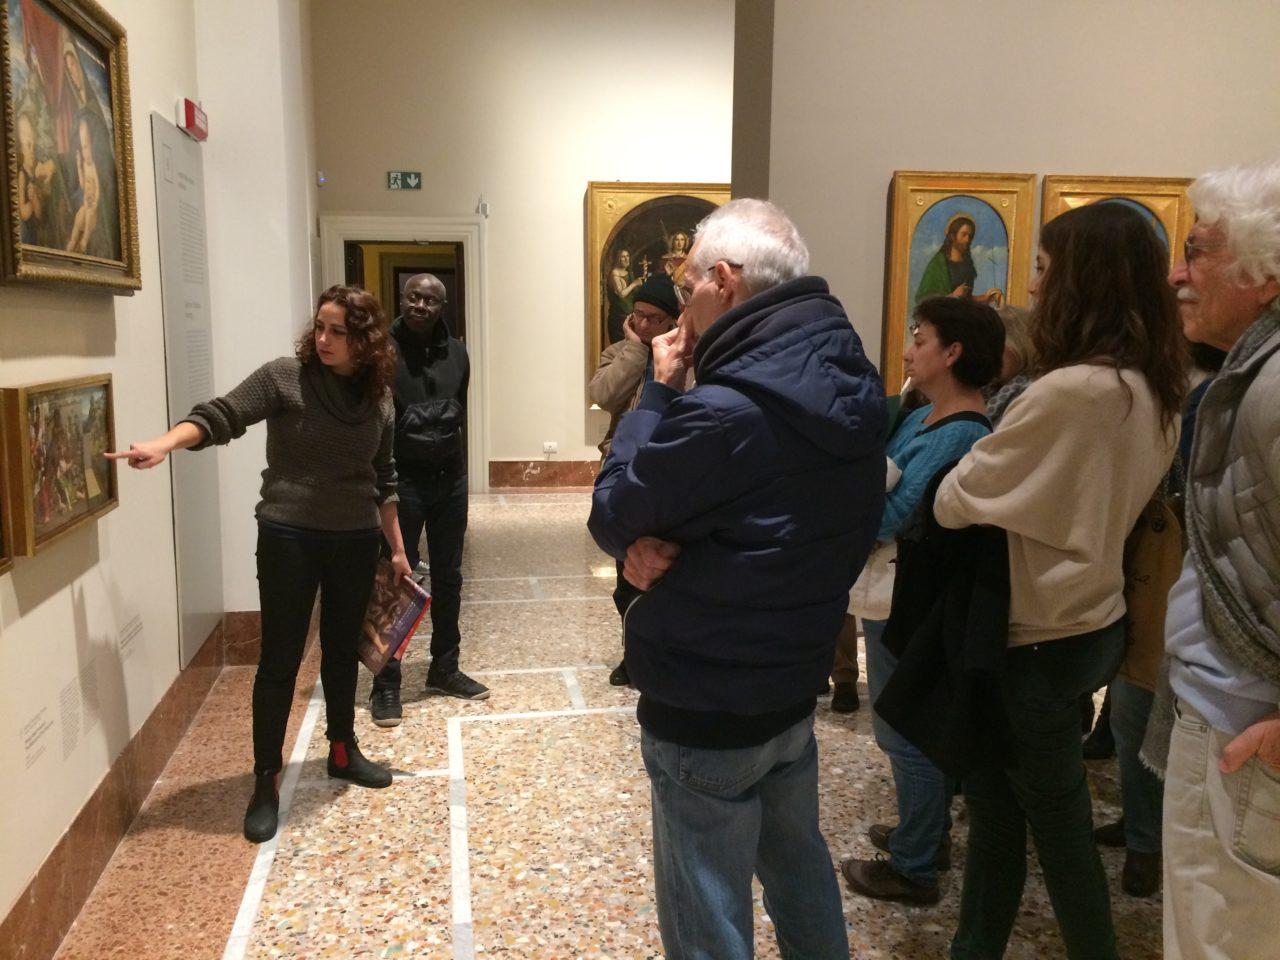 Le opere e i giorni, Accademia Carrara, narrazioni